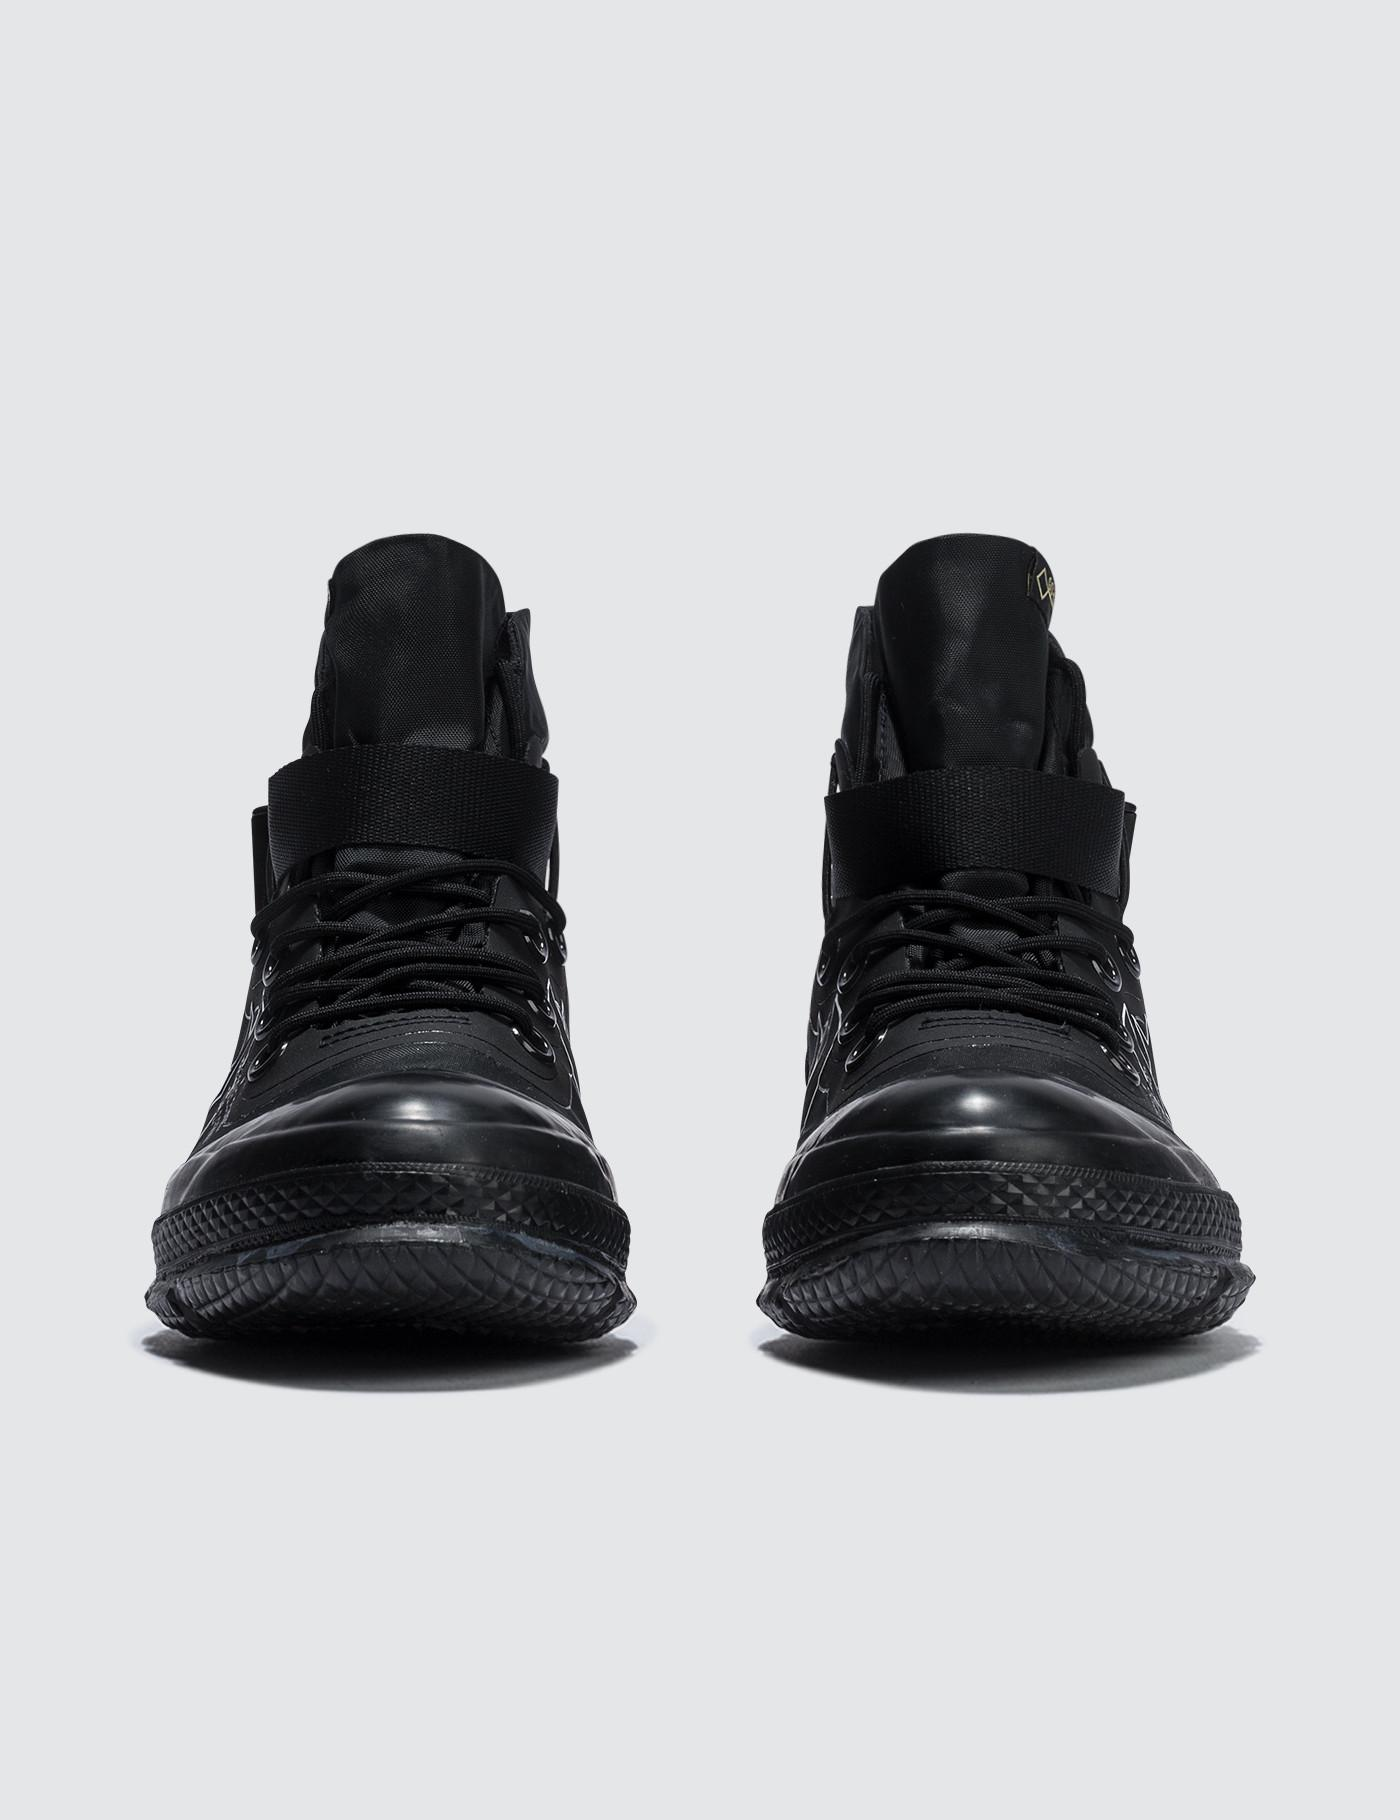 Converse Fastbreak Mc18 Hi in Black for Men - Lyst 7546b5bd9